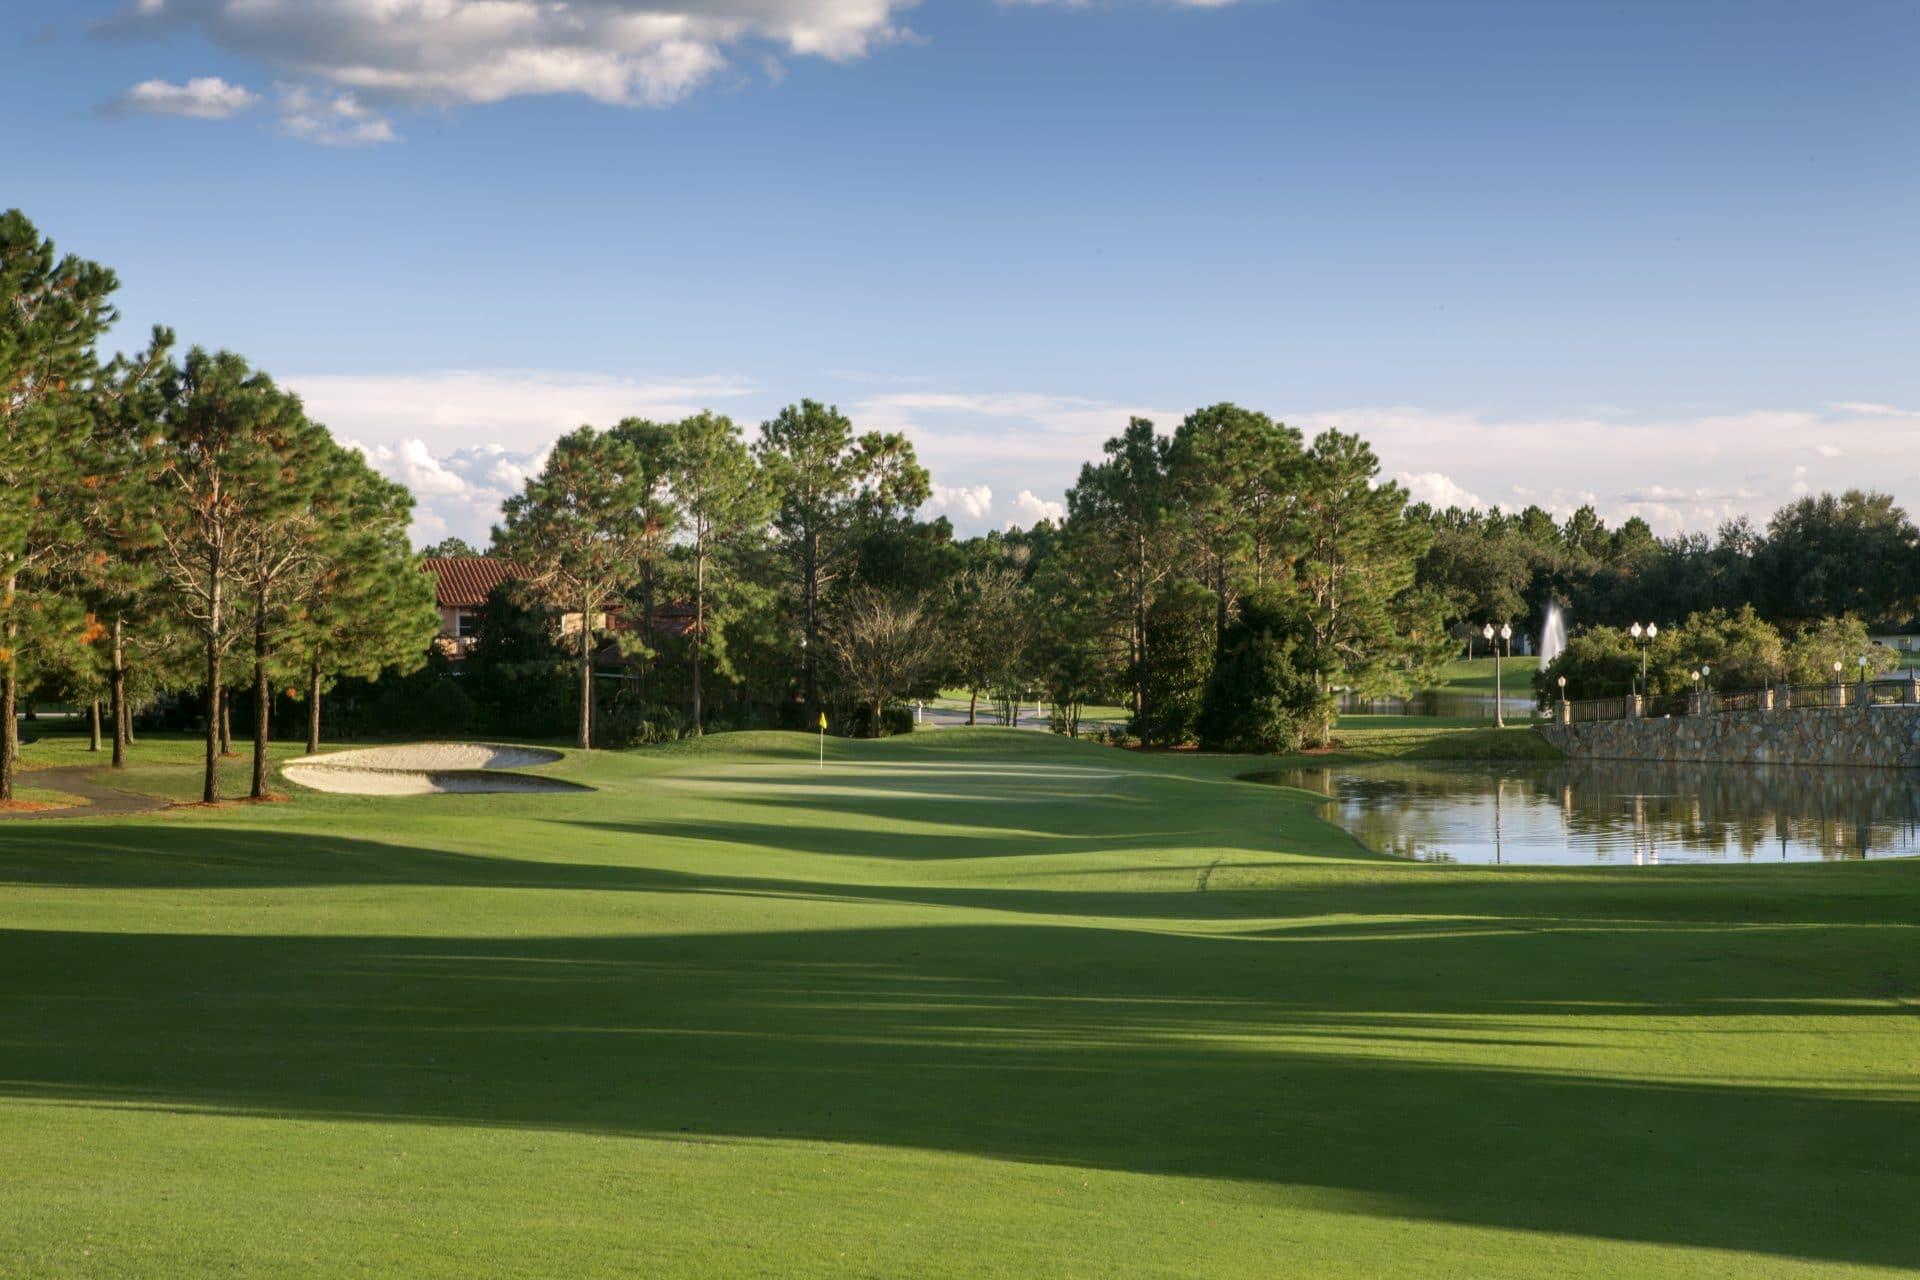 Russell Kirk / Golflinksphotography.com 2015